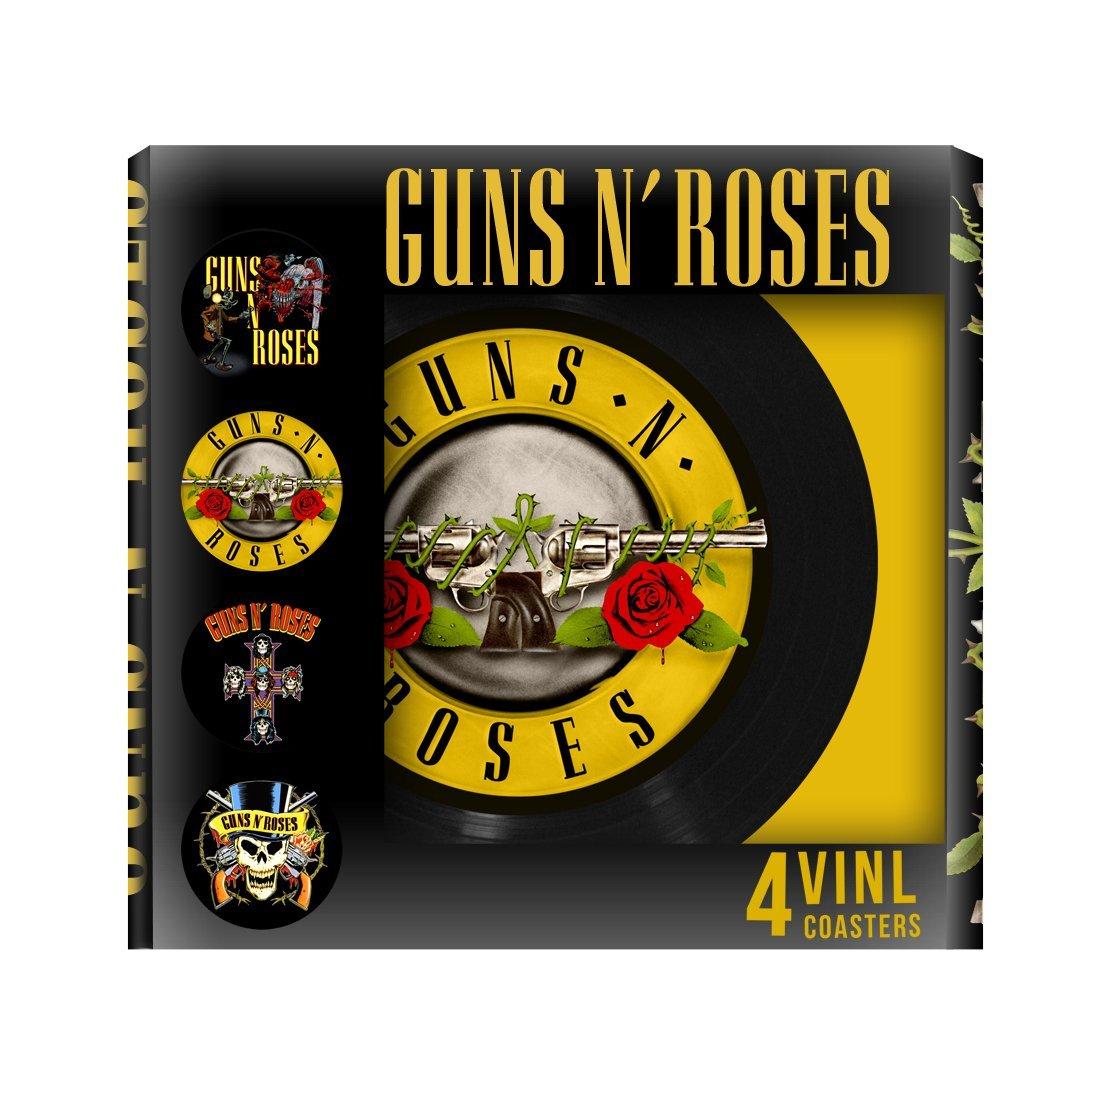 Guns N Roses 4pc Vinyl Coaster Set